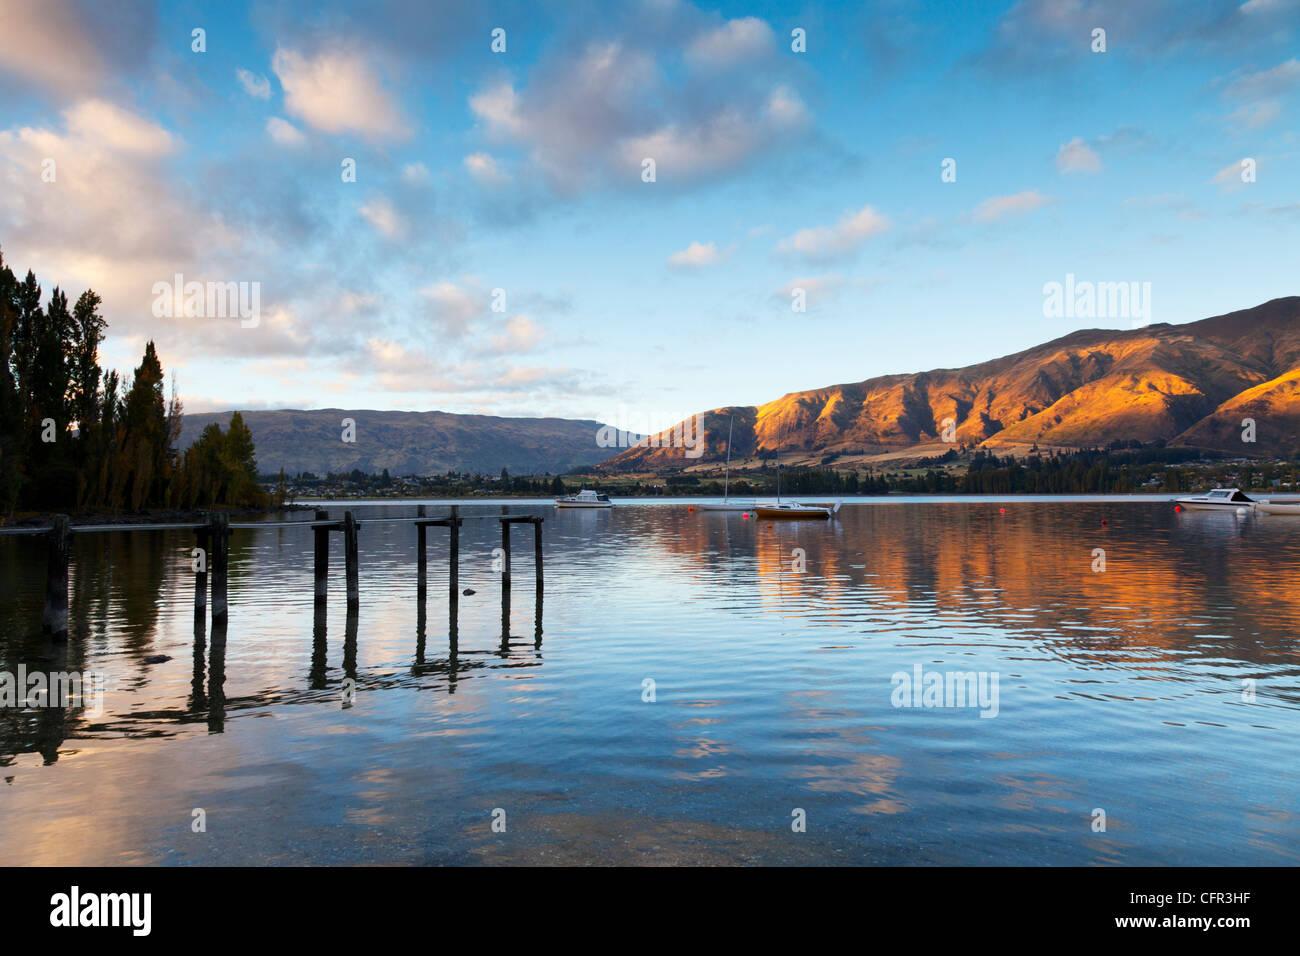 La mattina presto al Lago Wanaka, Otago, Nuova Zelanda. Foto Stock